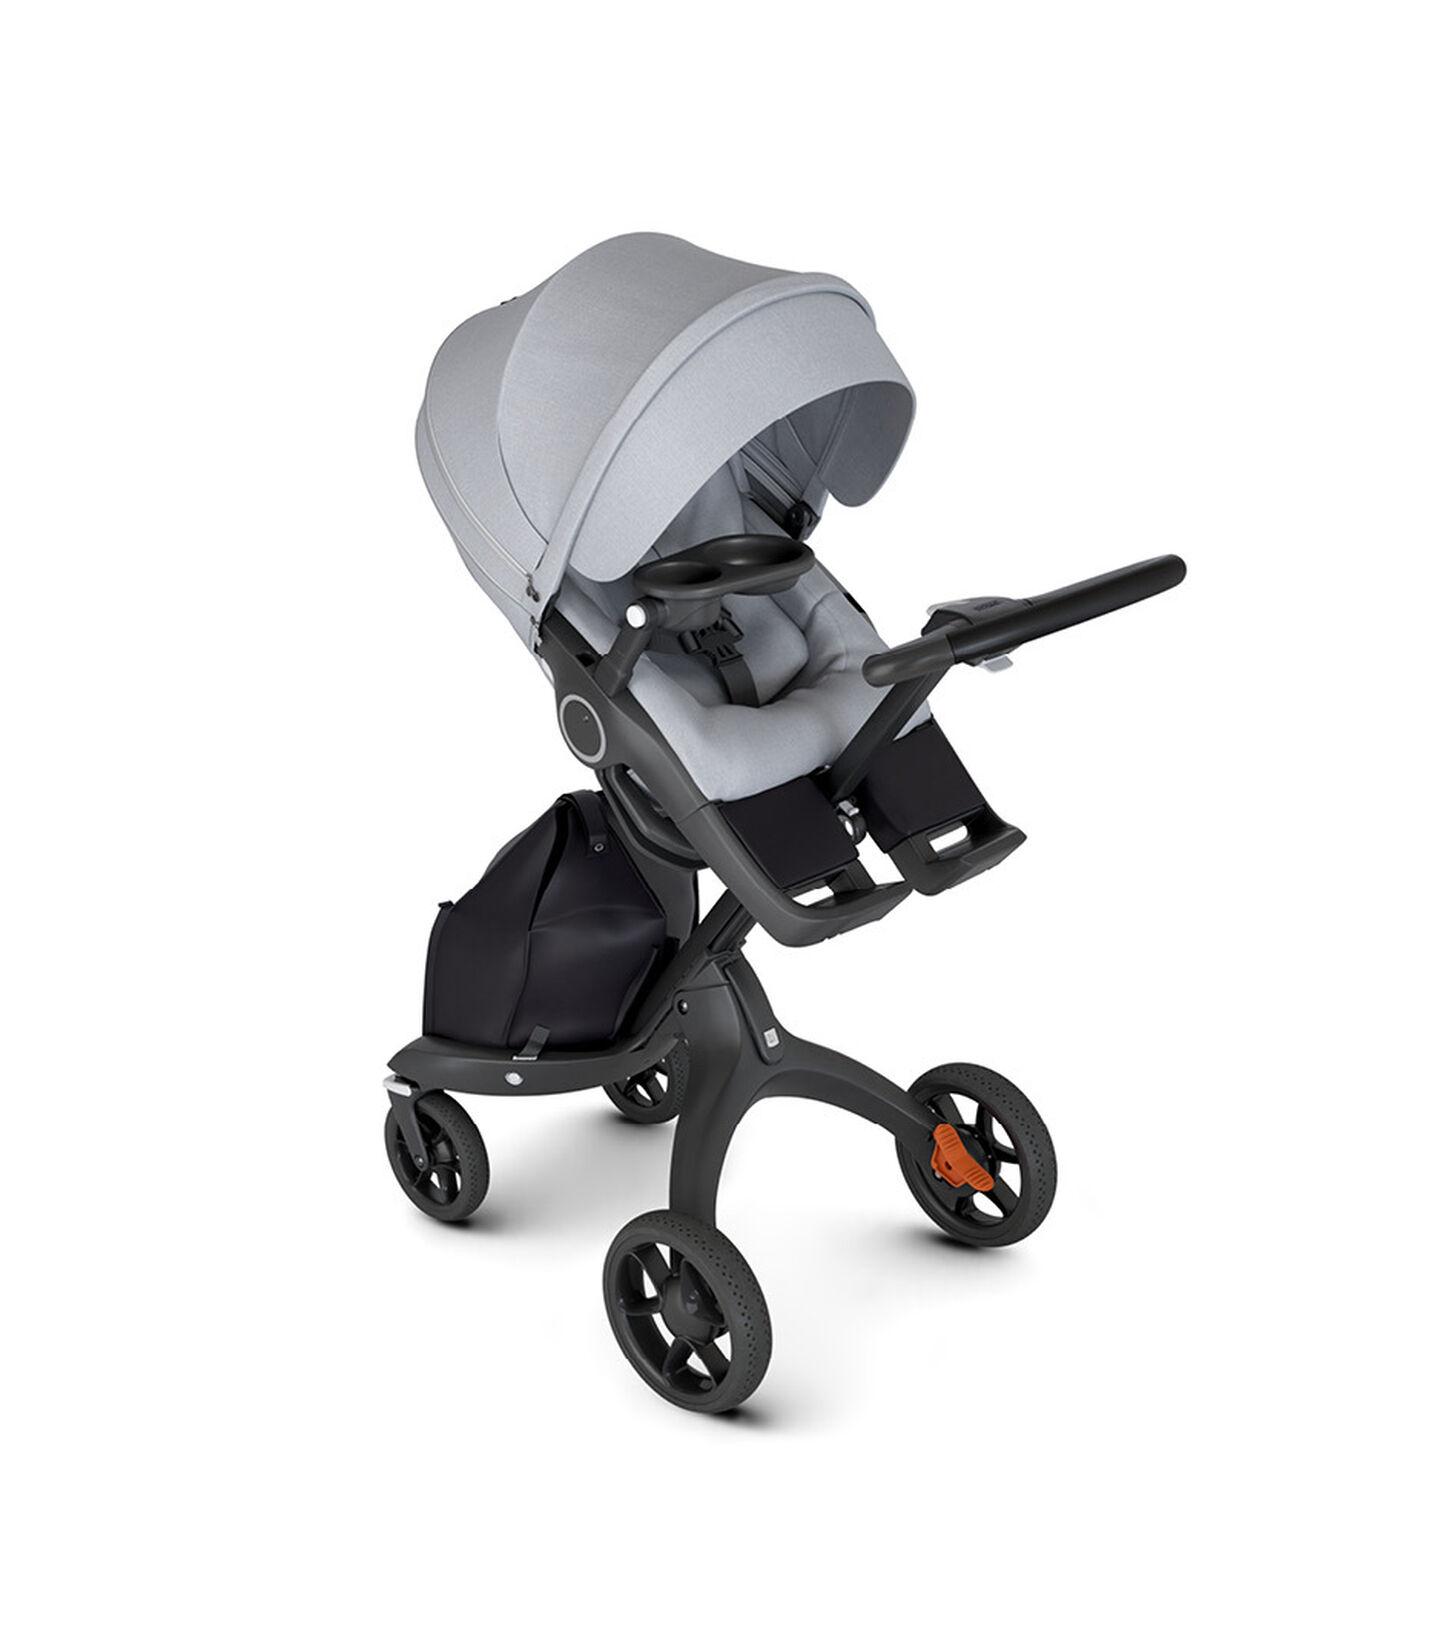 Stokke® Stroller Snack Tray for Stokke® Stroller Seat. Stokke® Xplory®.